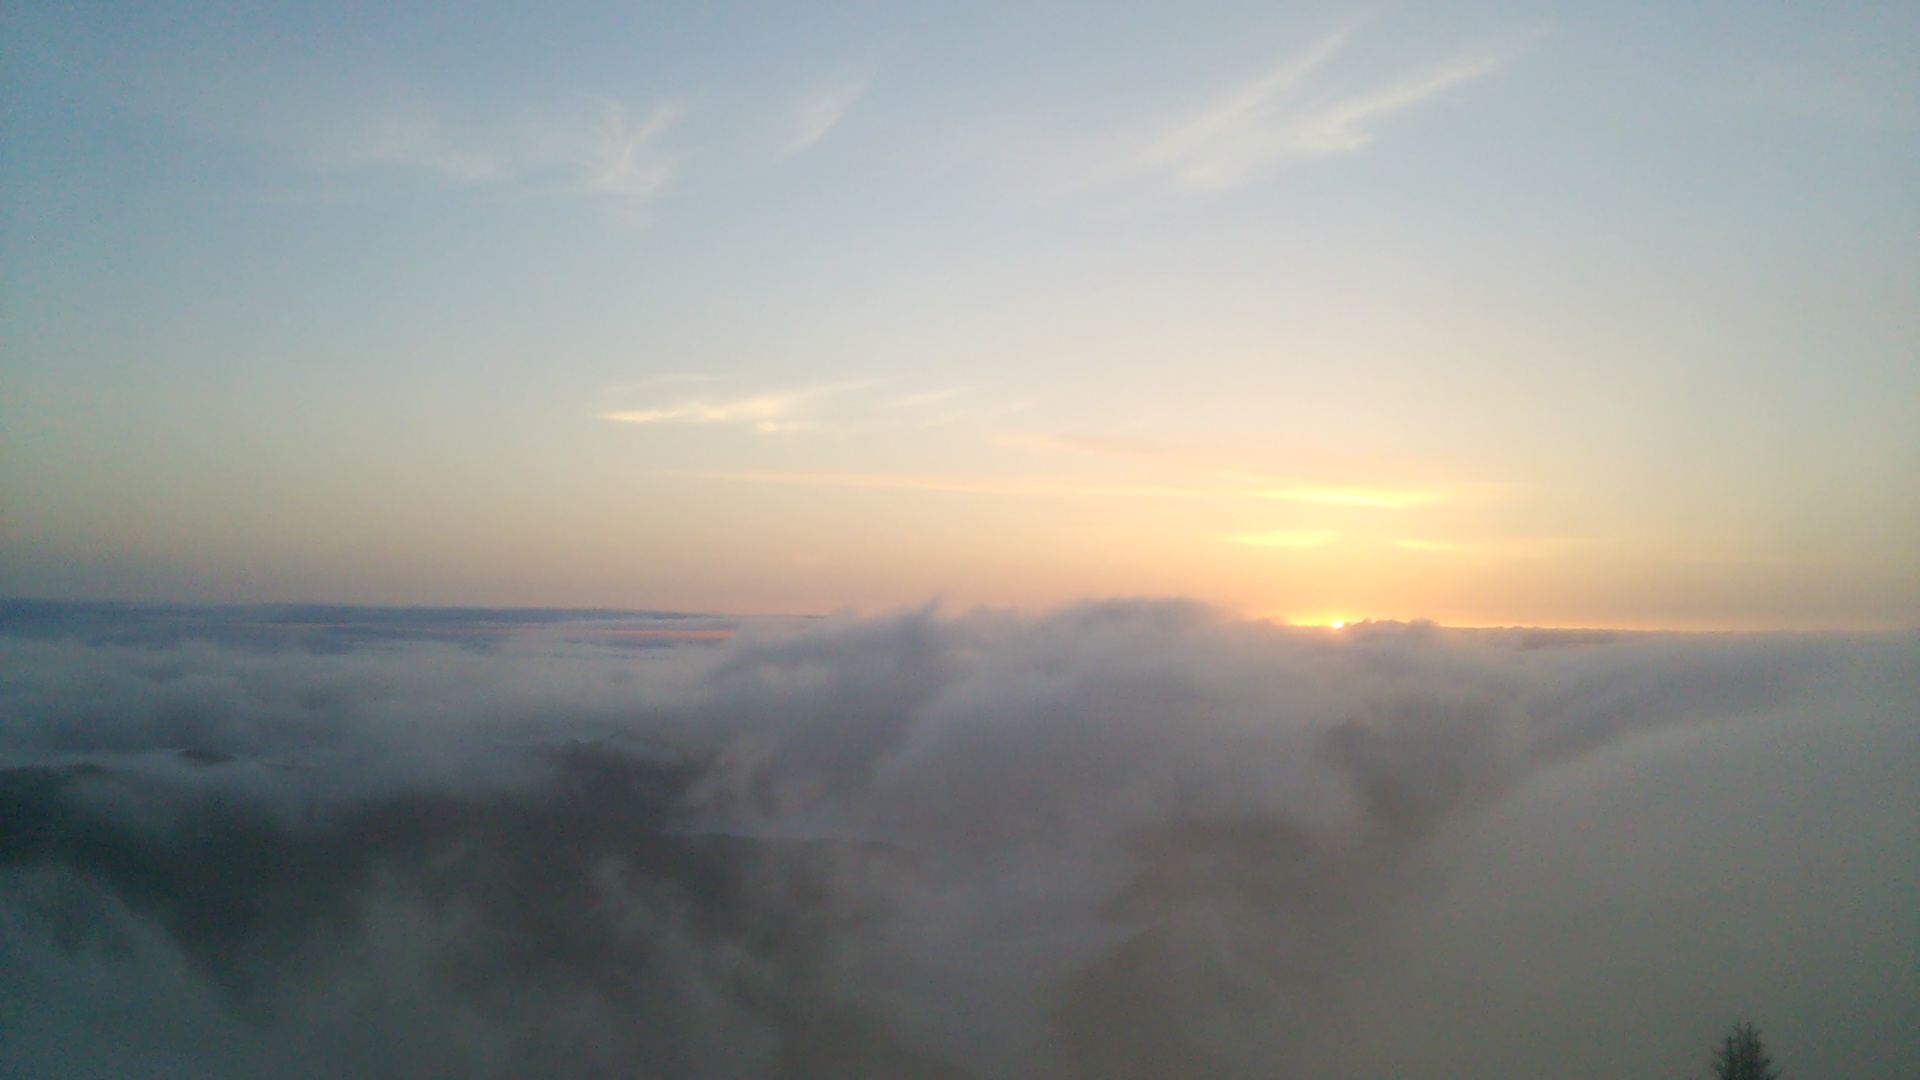 6月8日 朝の気温9℃。_c0089831_522057.jpg